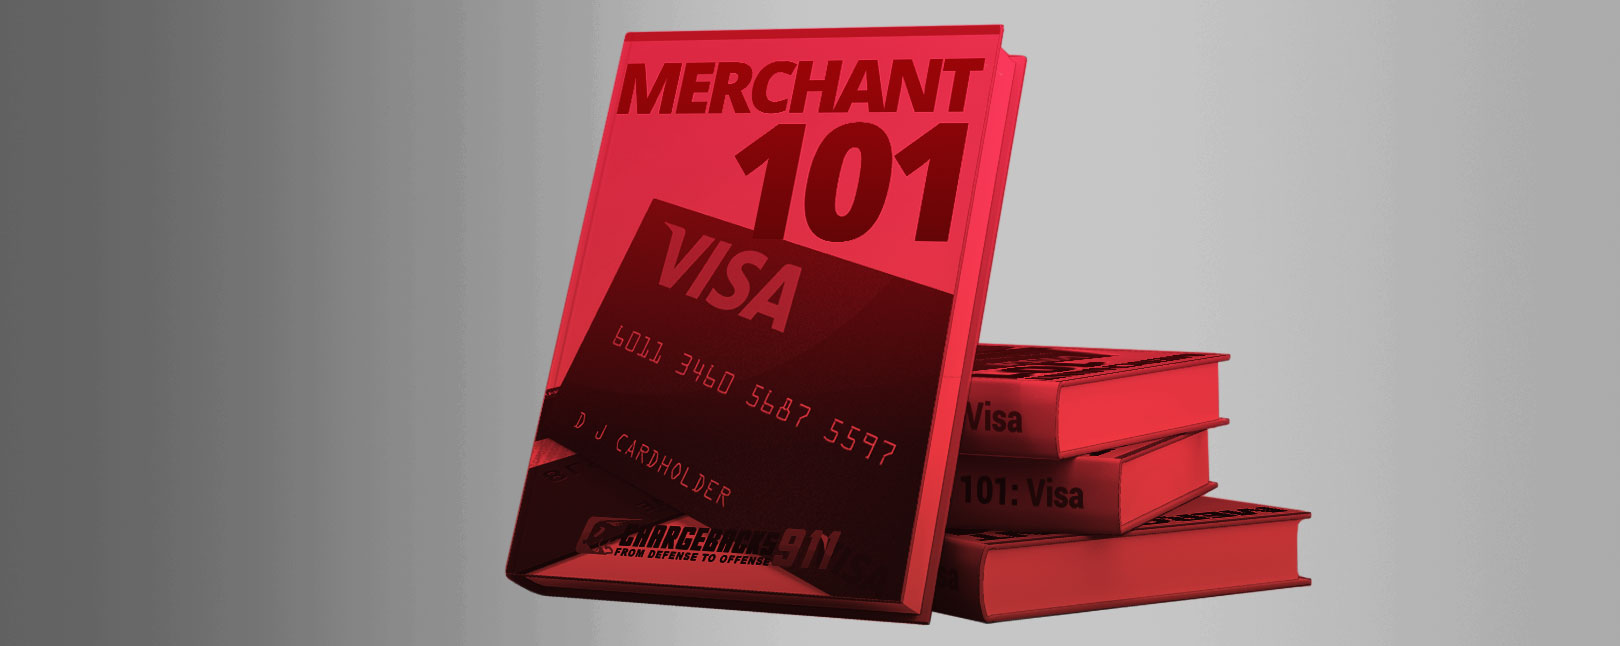 visa-merchant-101